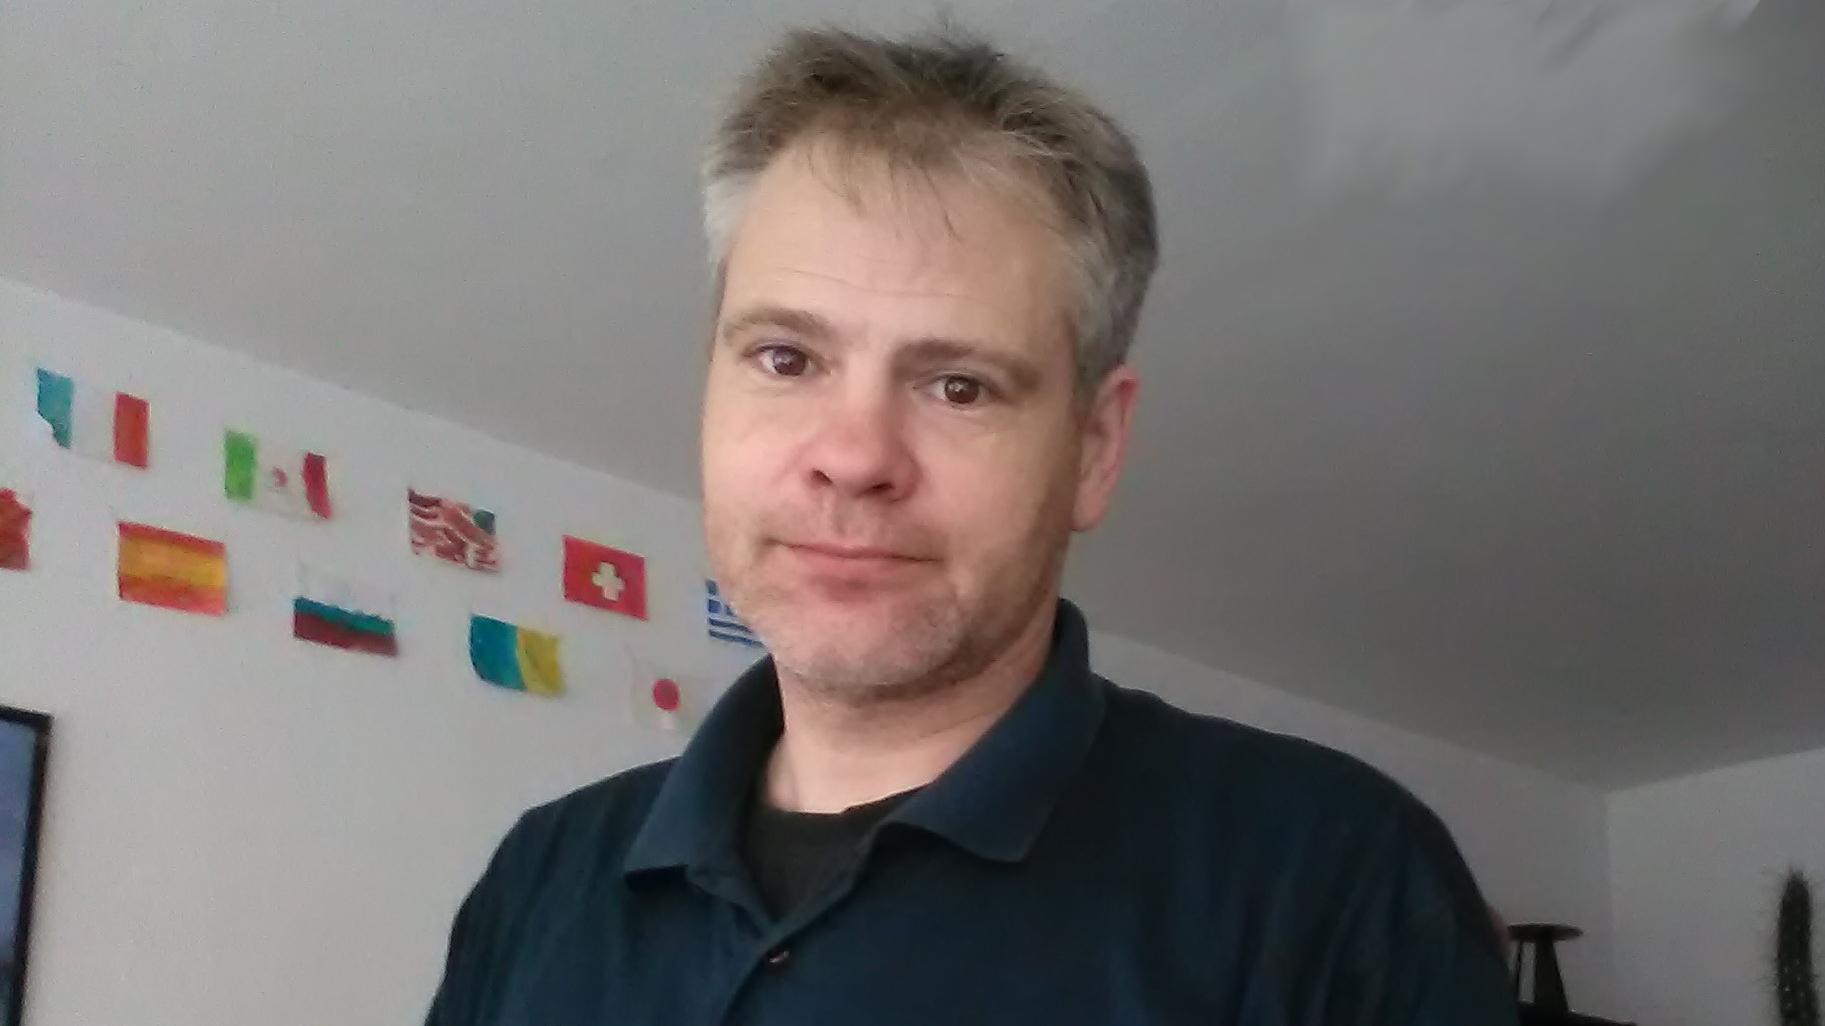 Markus Theisen